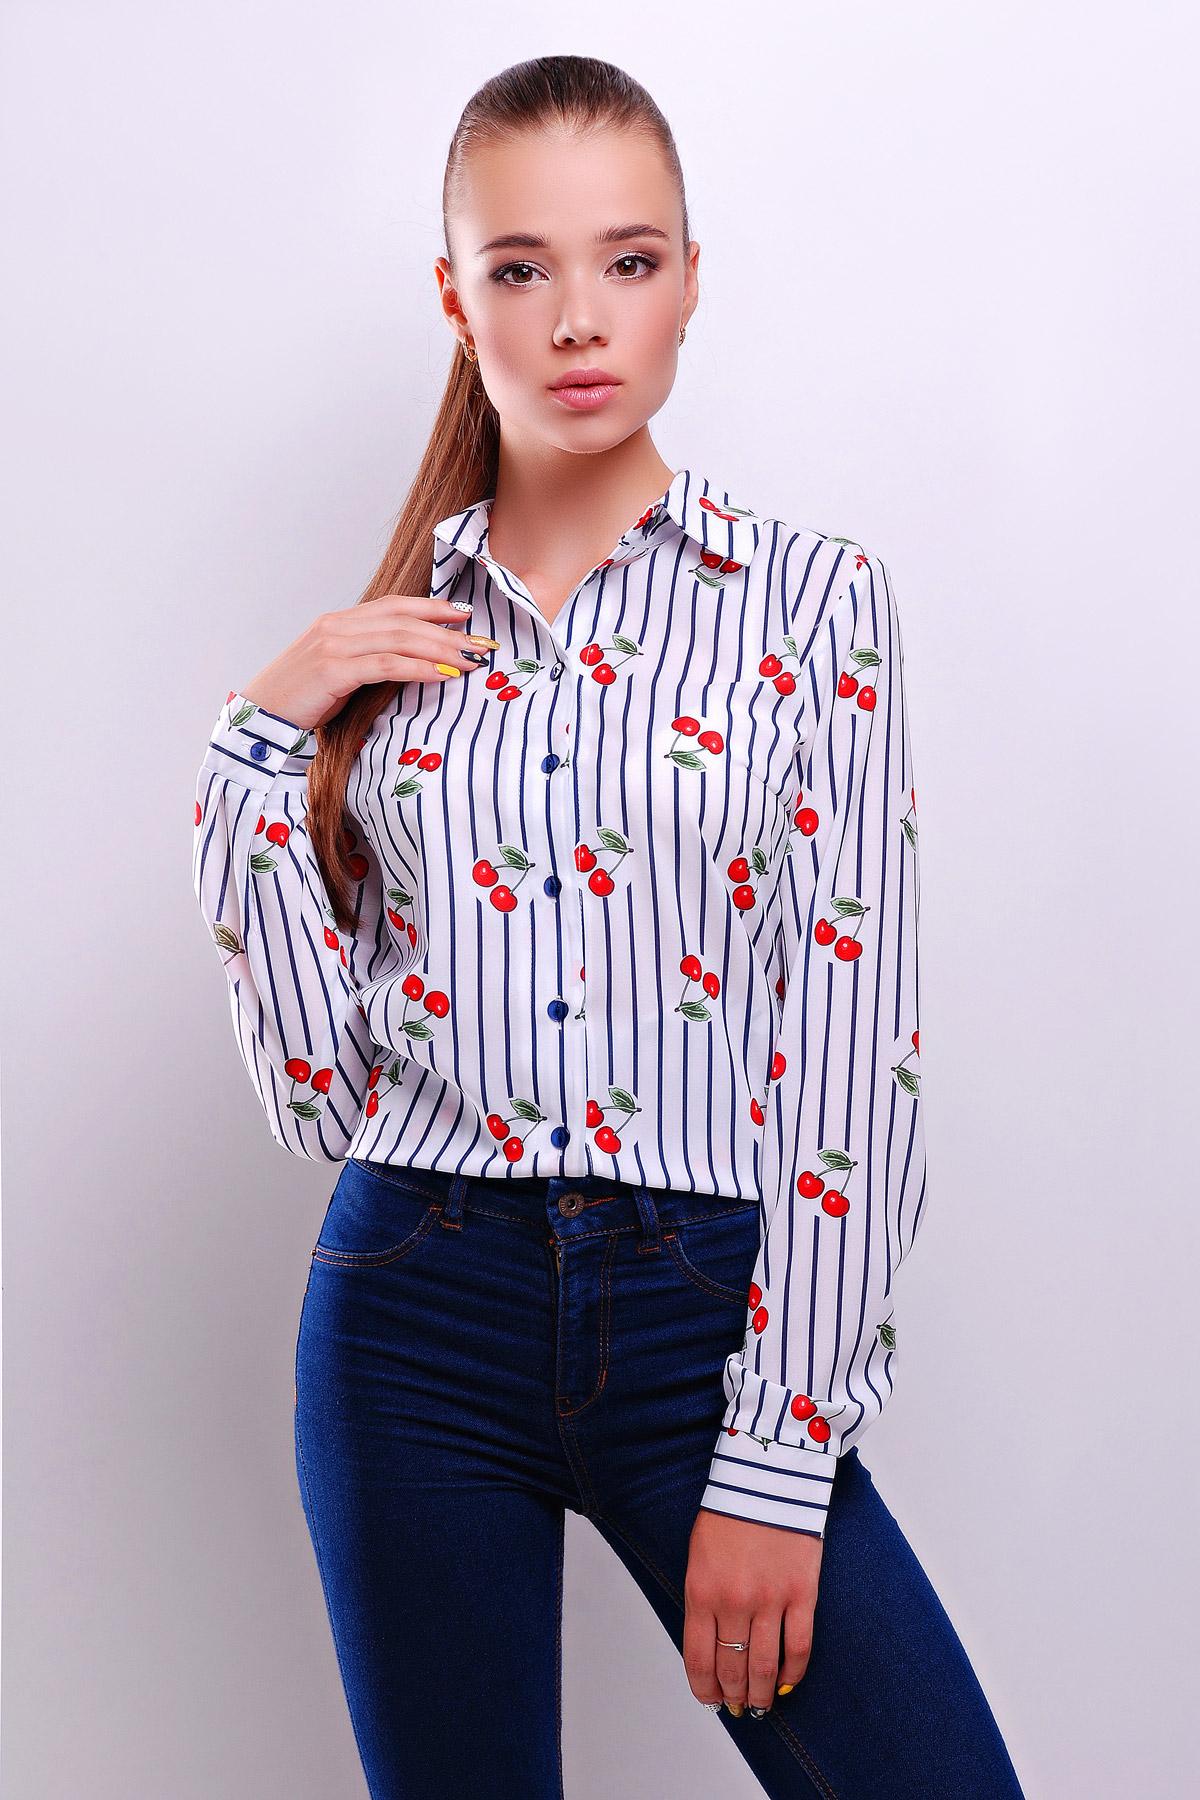 bf5c34d25e0 белая блузка из шифона с коротким рукавом. Полоска темно синяя блуза Чери  д р